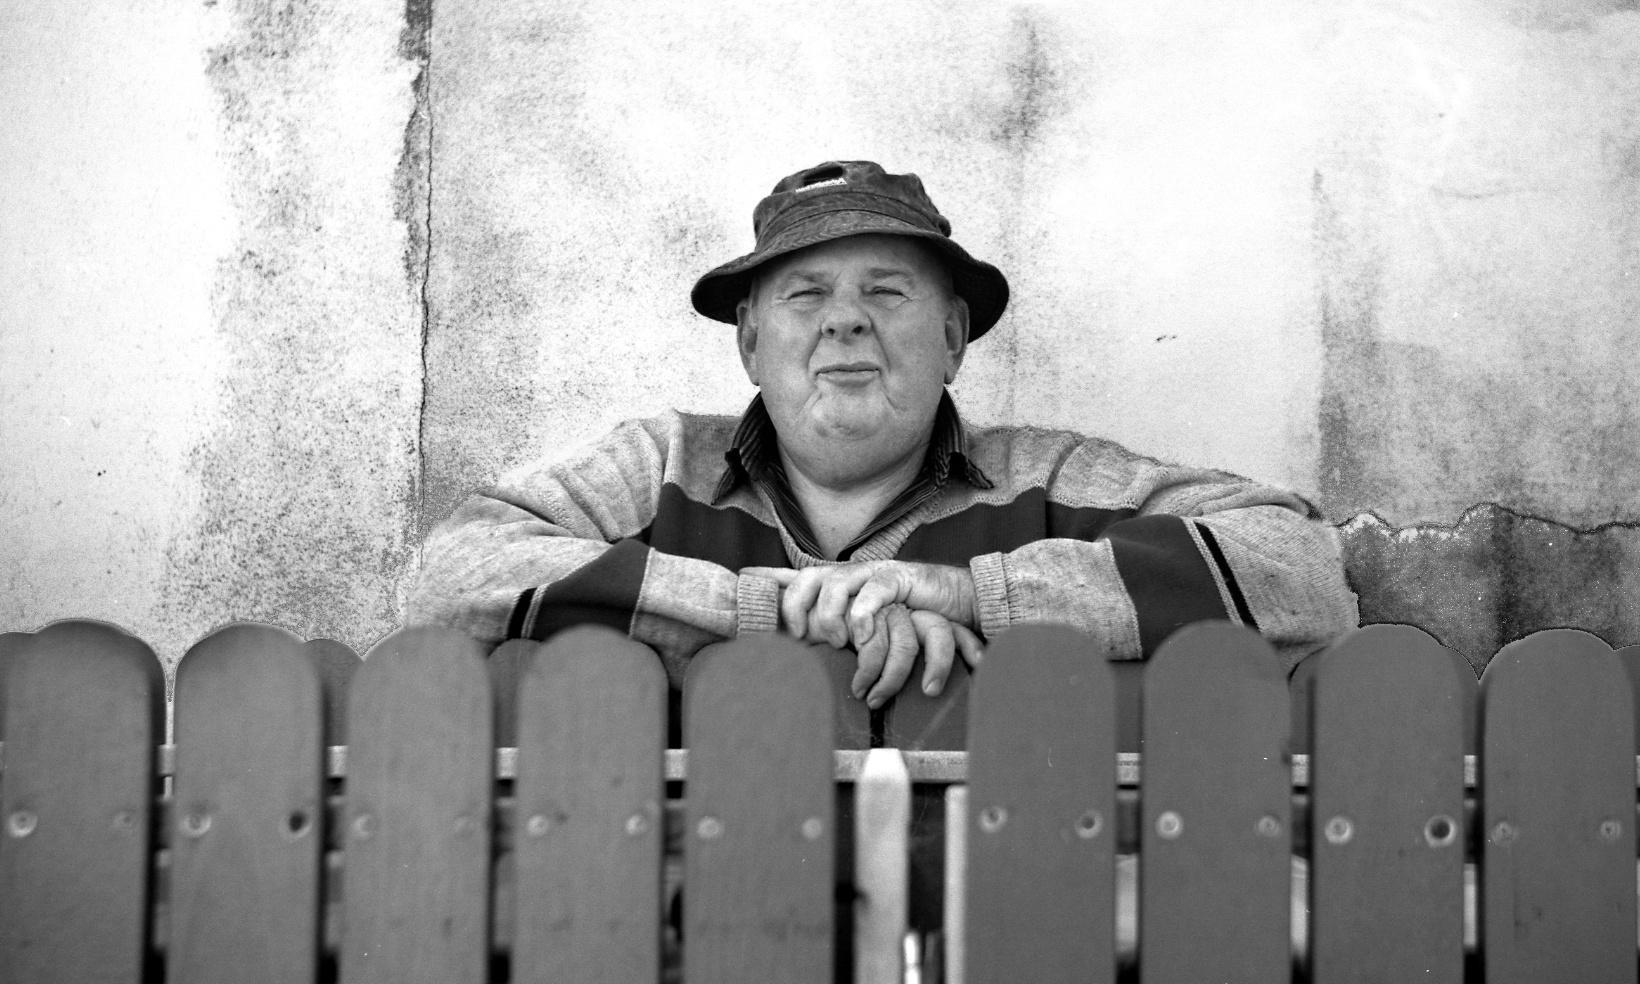 Les Murray obituary